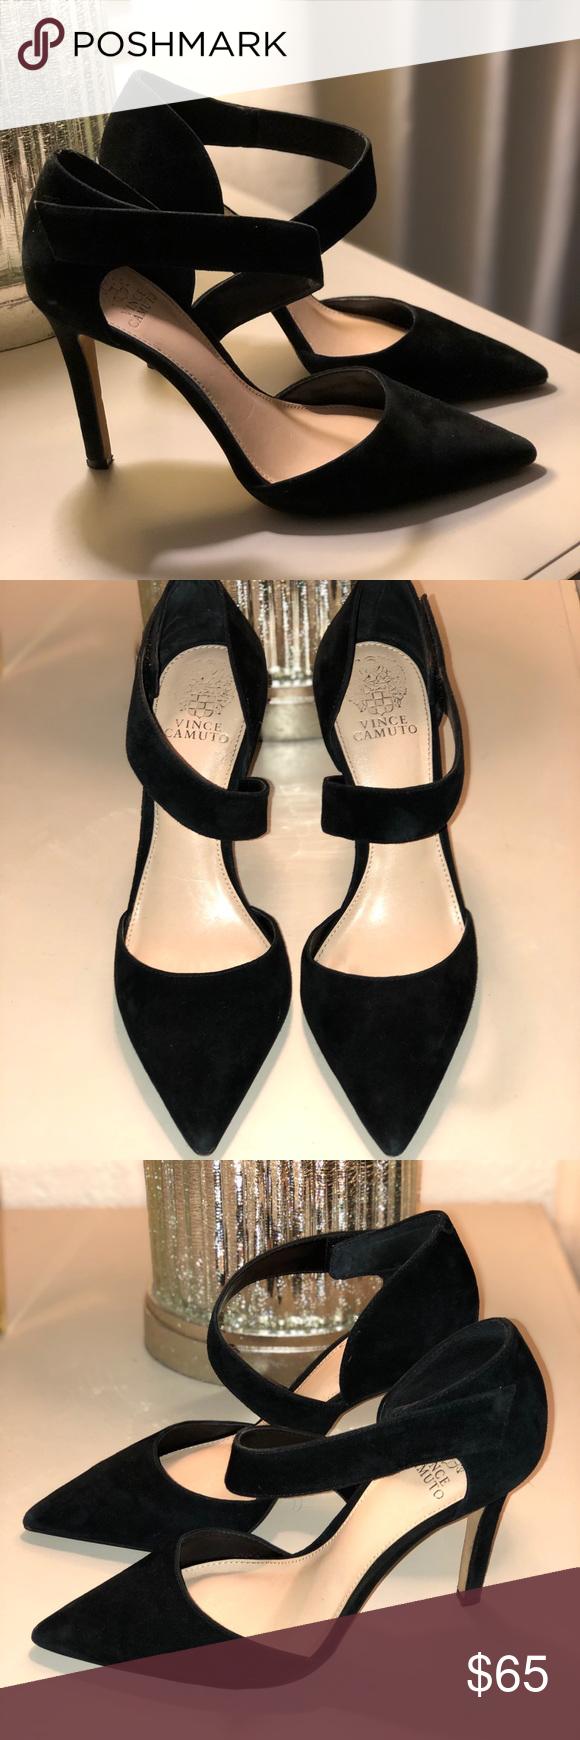 1b62b923e5c Vince Camuto Carlotte Pump Hardly worn. Black suede. 100% Leather ...